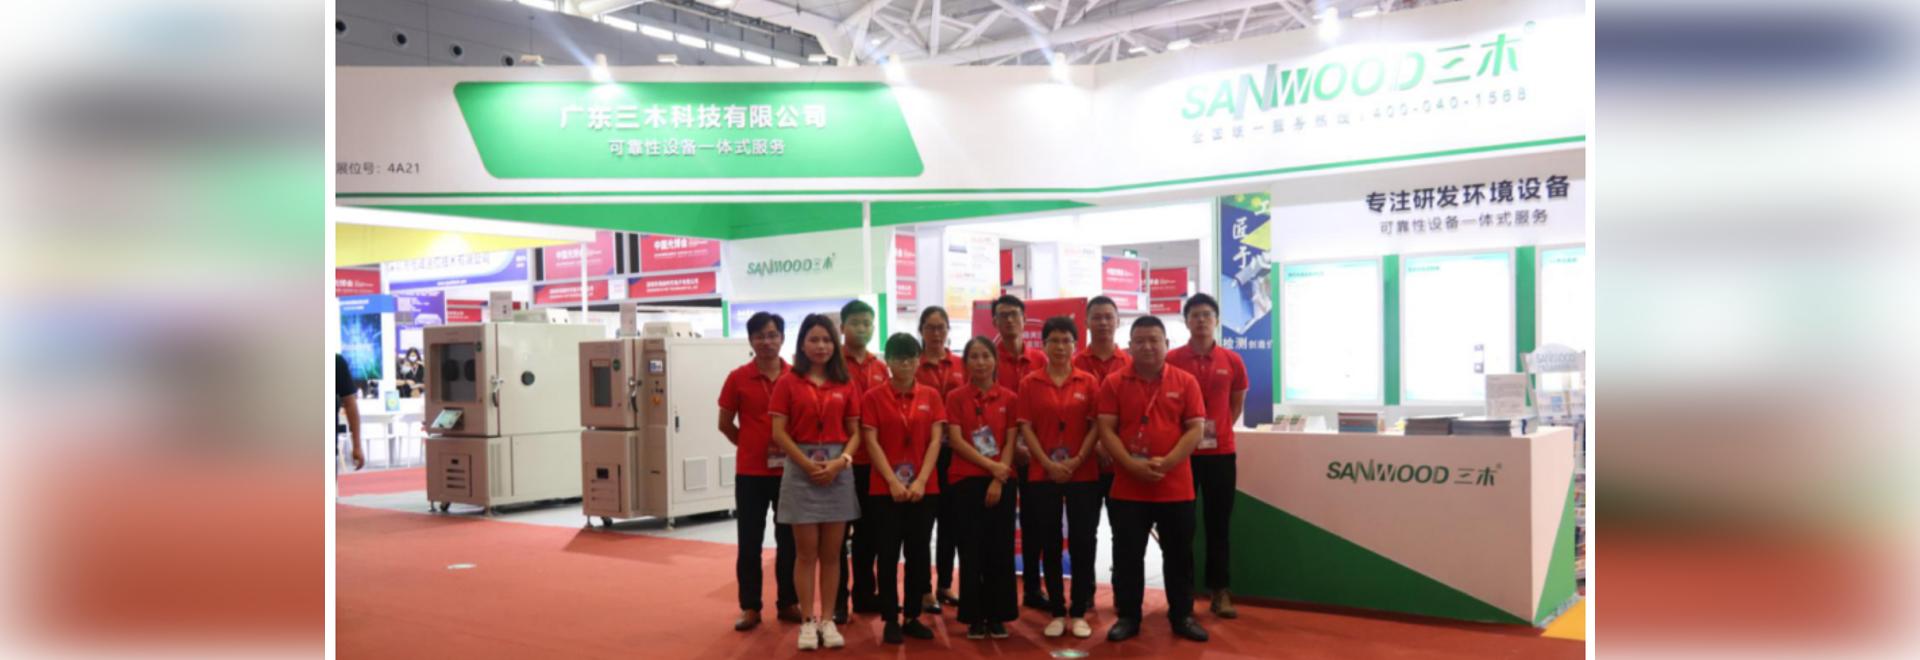 2020 ELEXCON Shenzhen Intl' Electronics Show